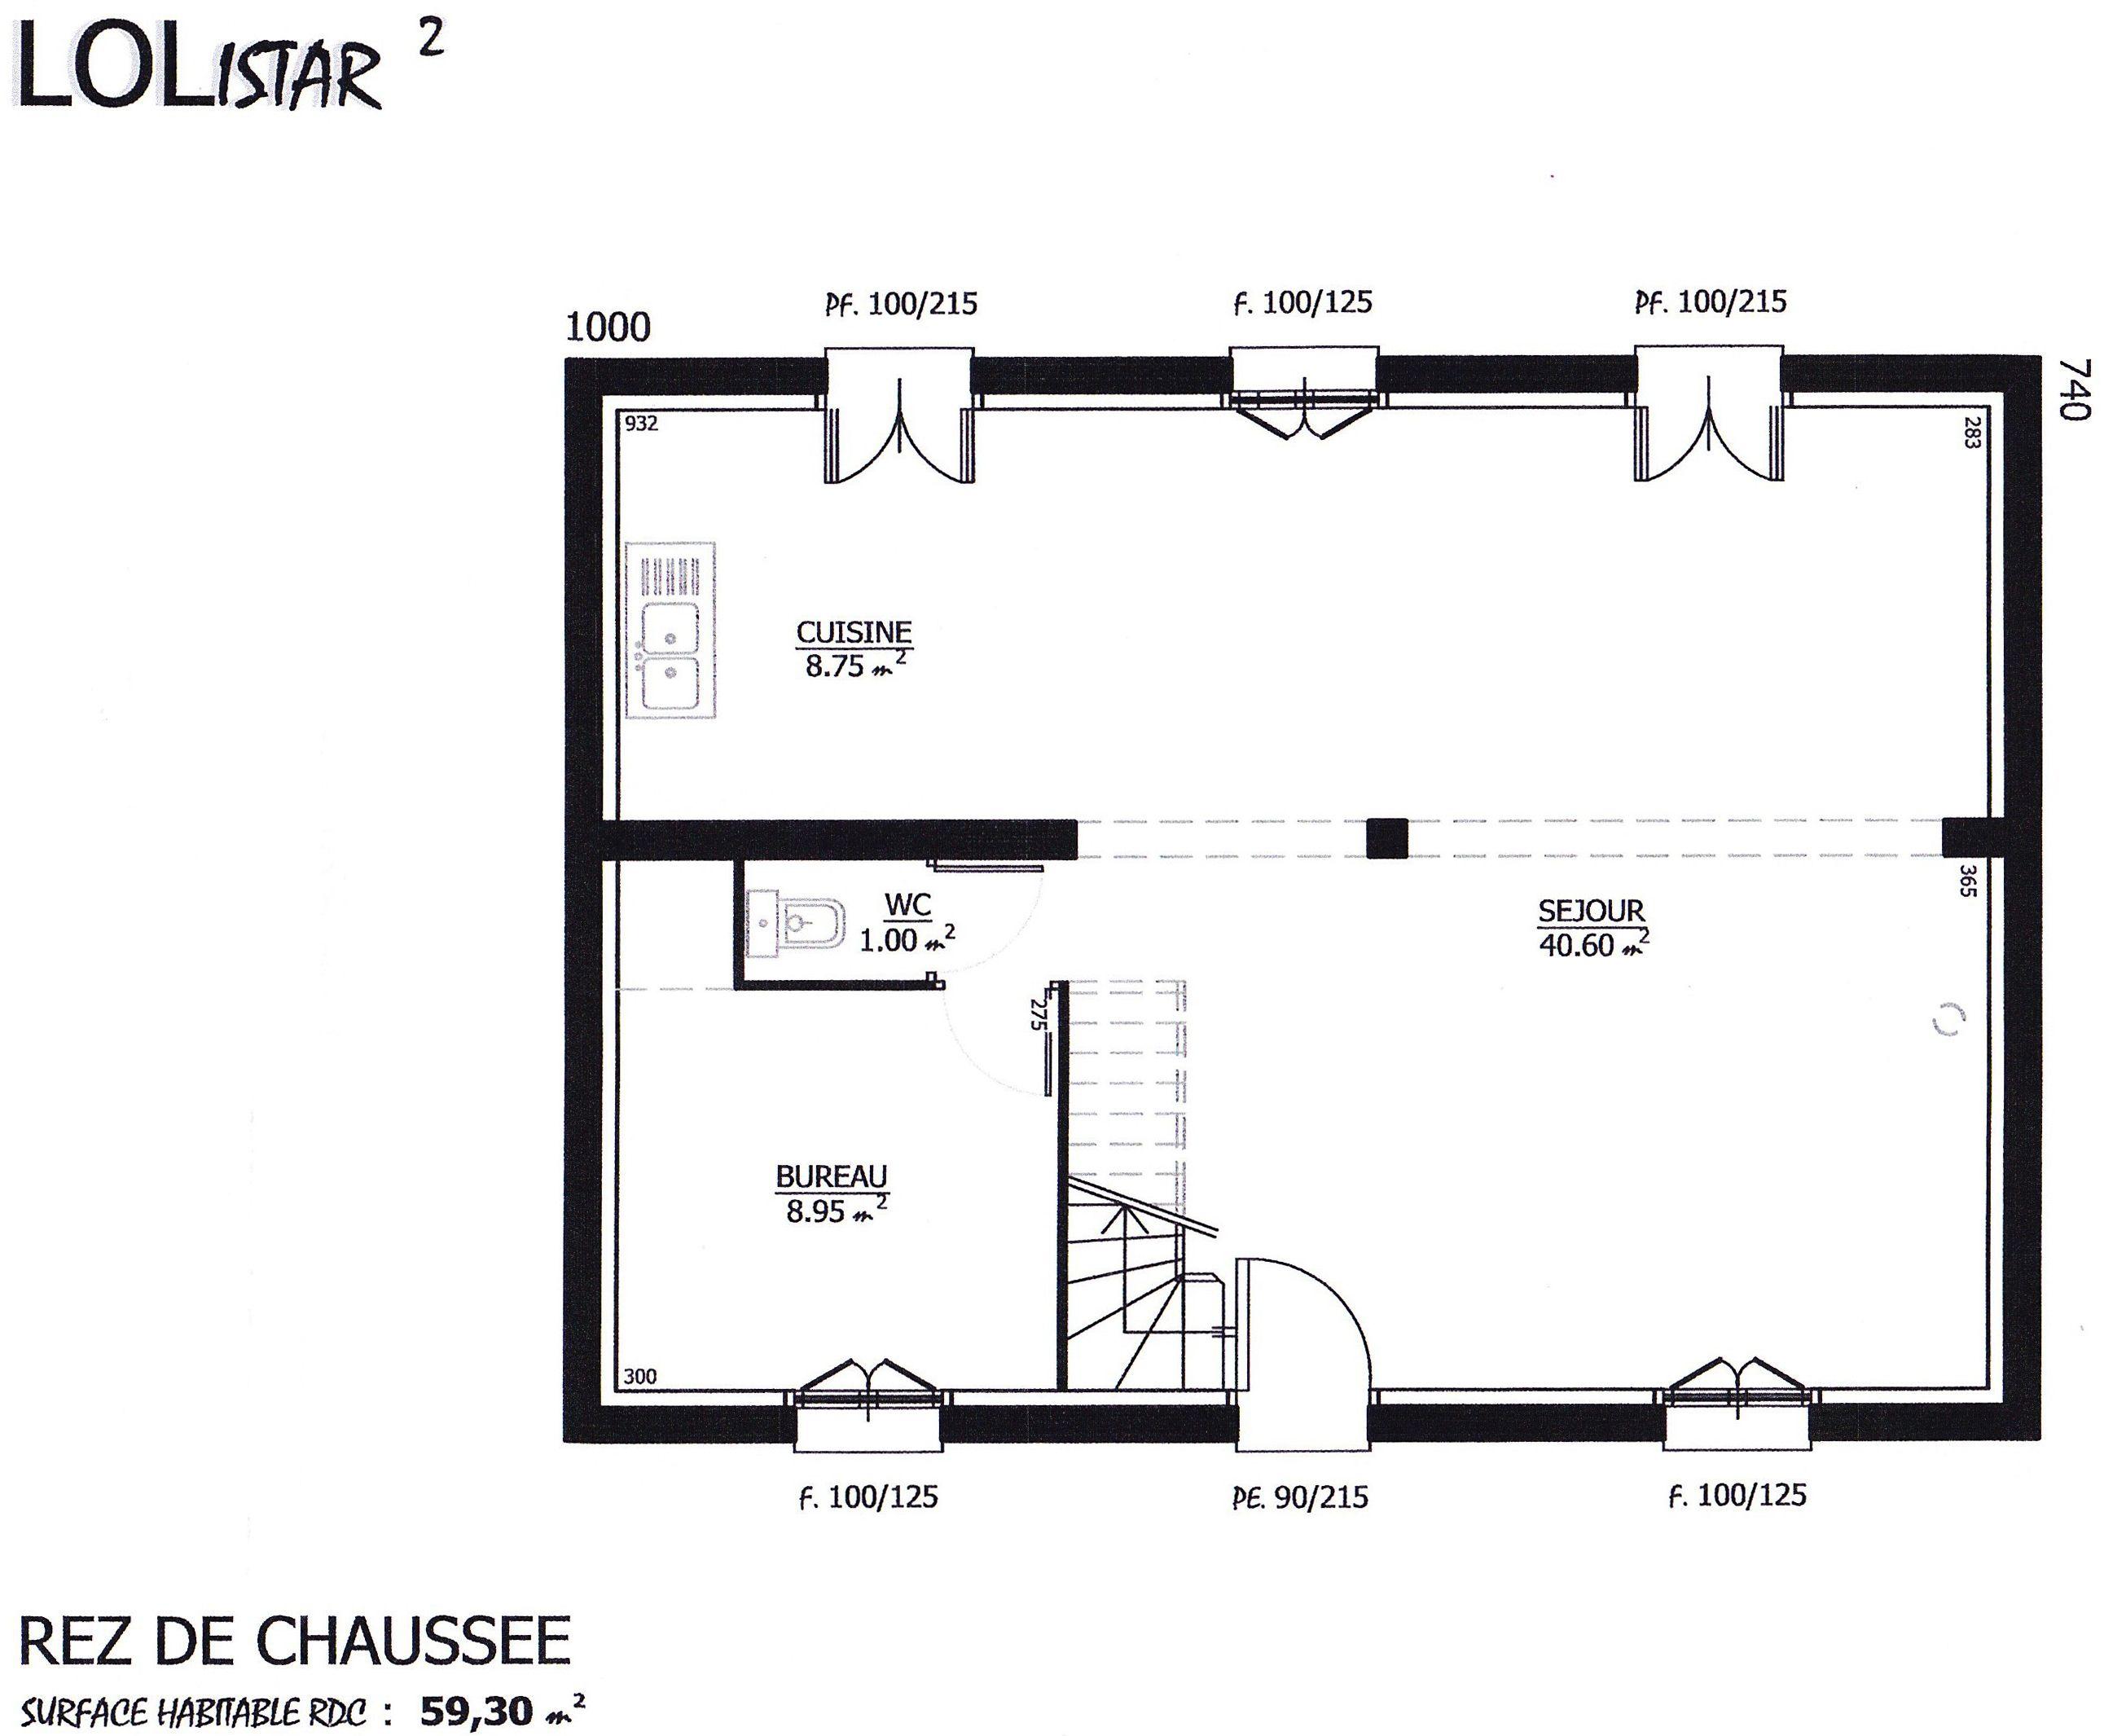 Maison lolistar maison lol 123500 euros 117 m2 faire construire sa